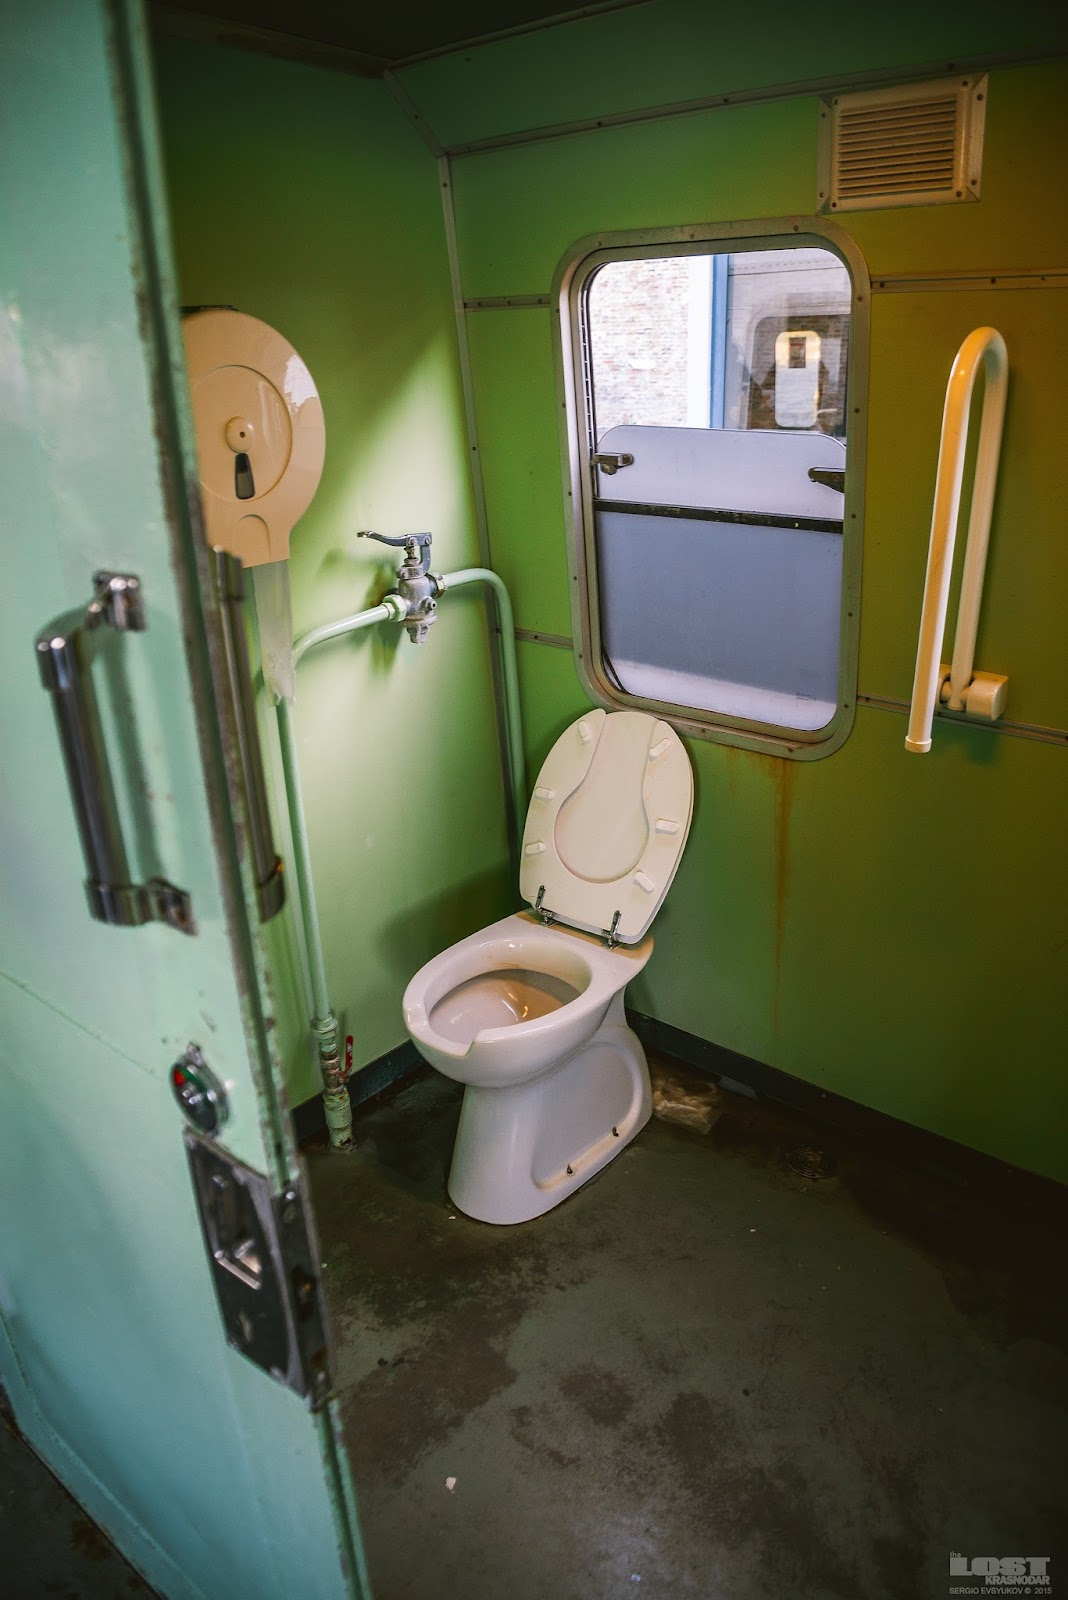 poezd-tualet-pisayut